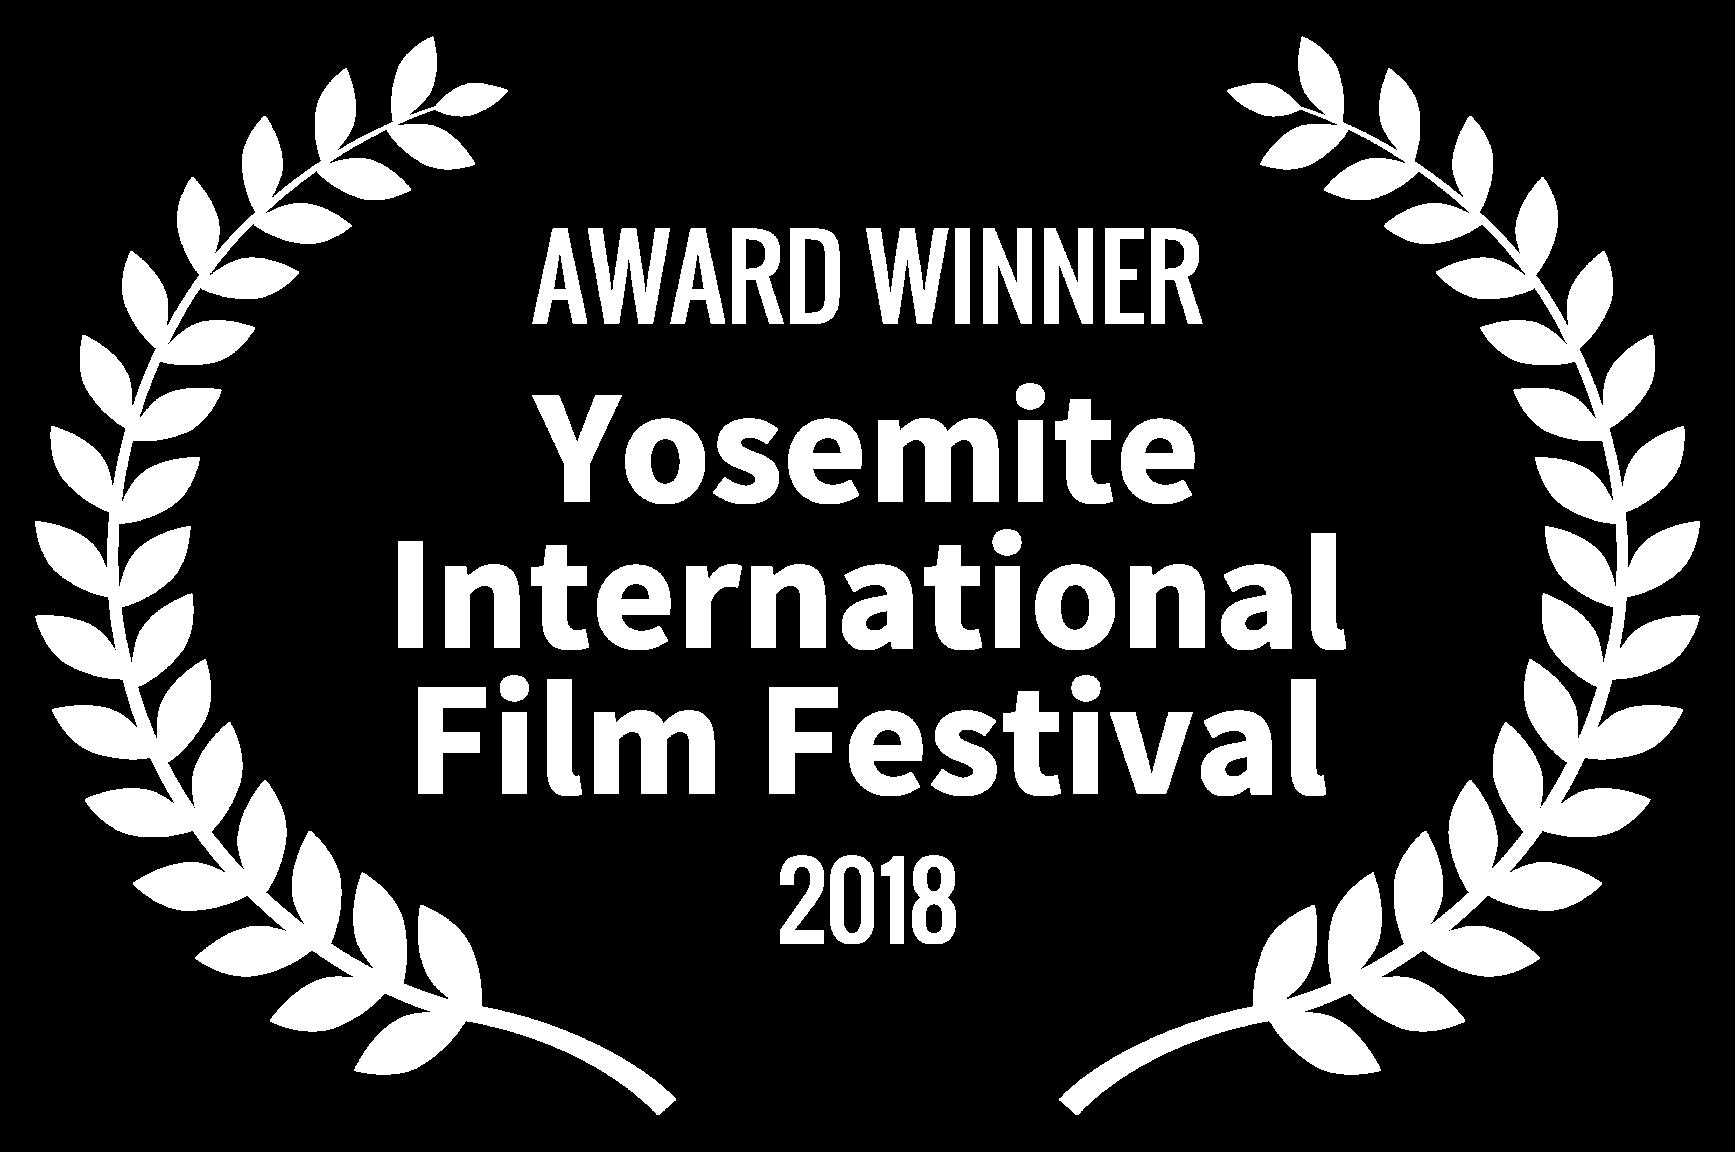 AWARD WINNER - Yosemite International Film Festival - 2018.png